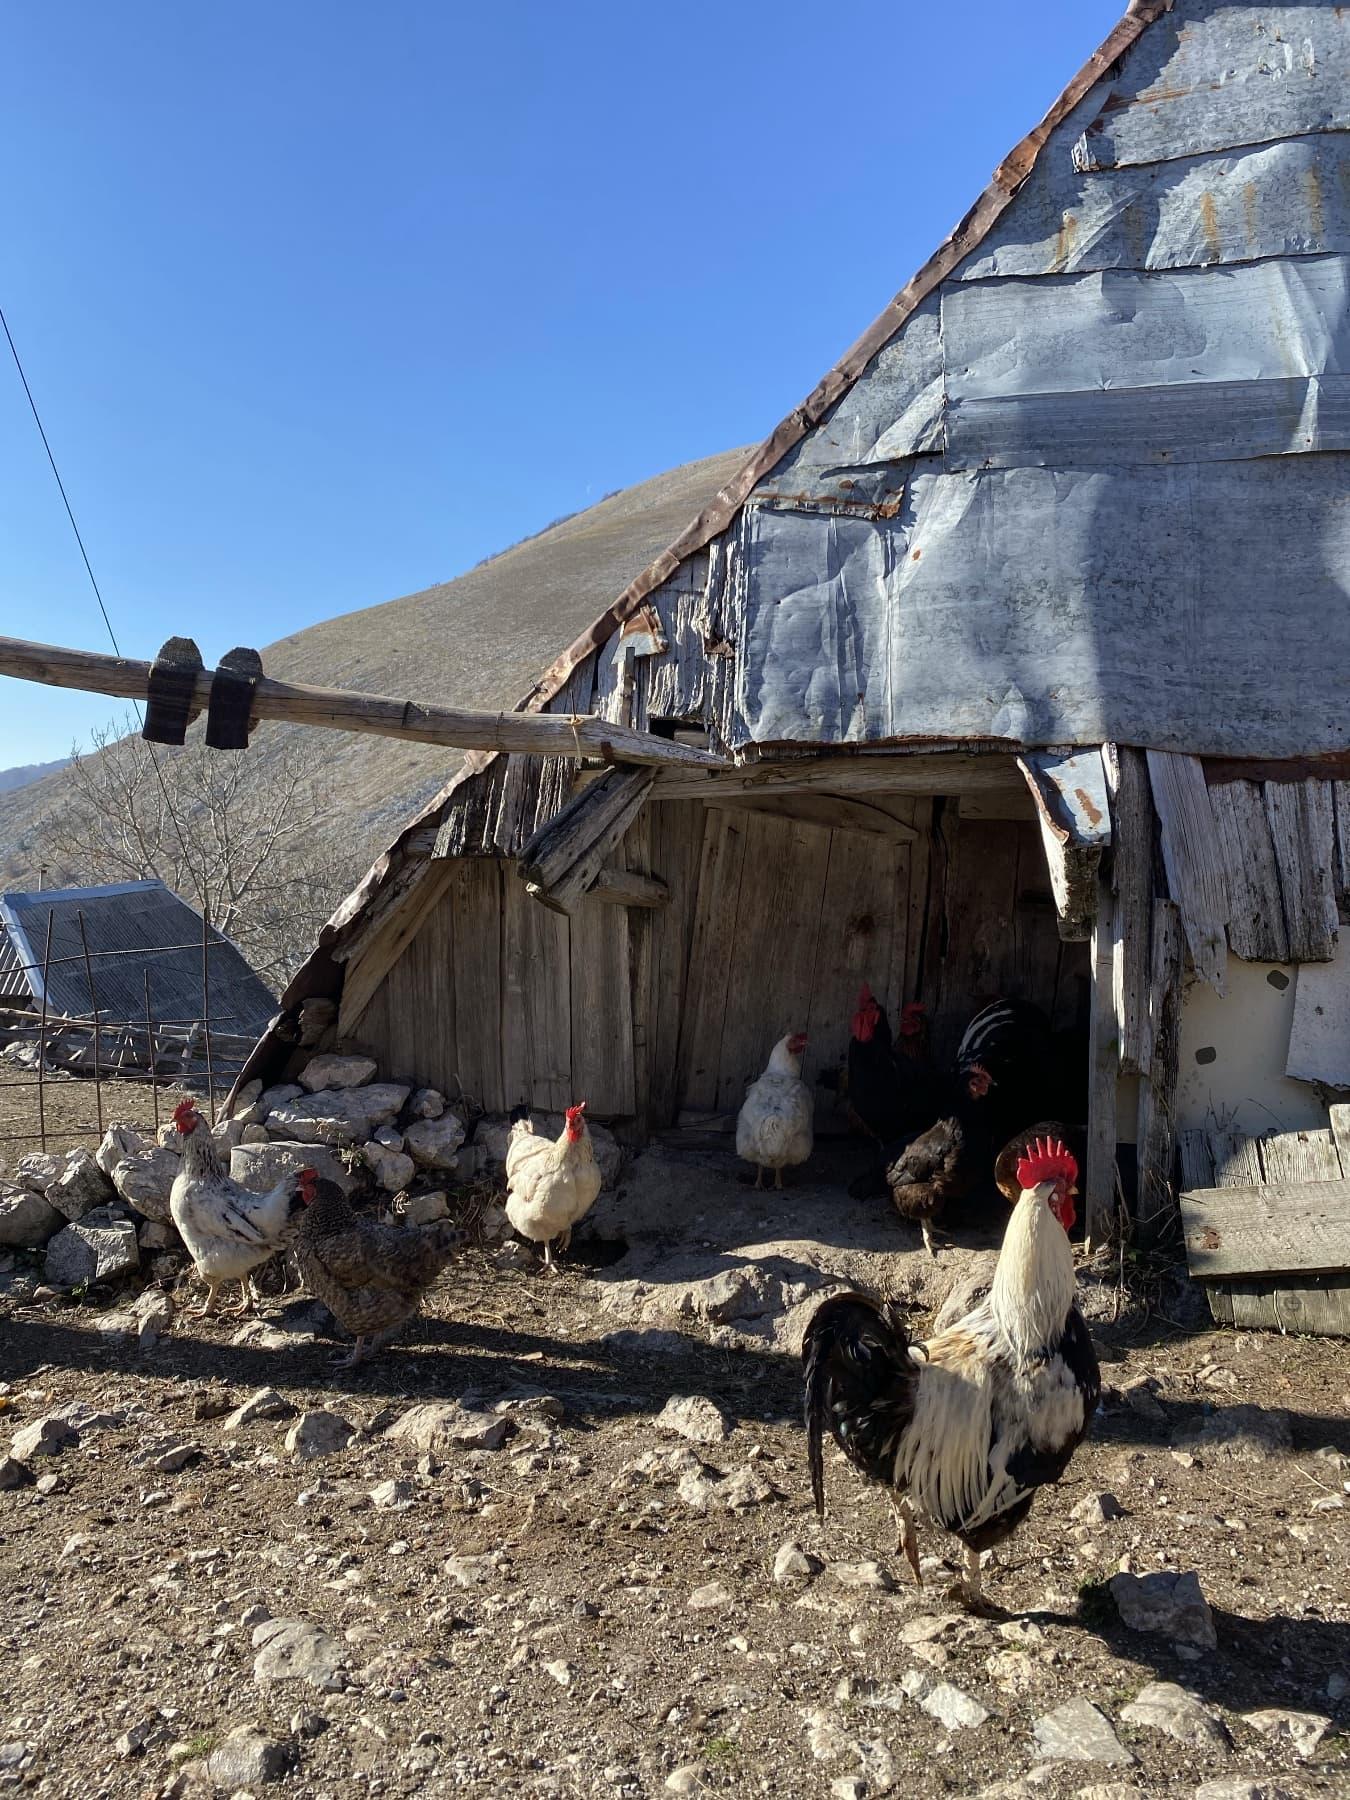 So close to heaven - In The Mountain Village Lukomir 11